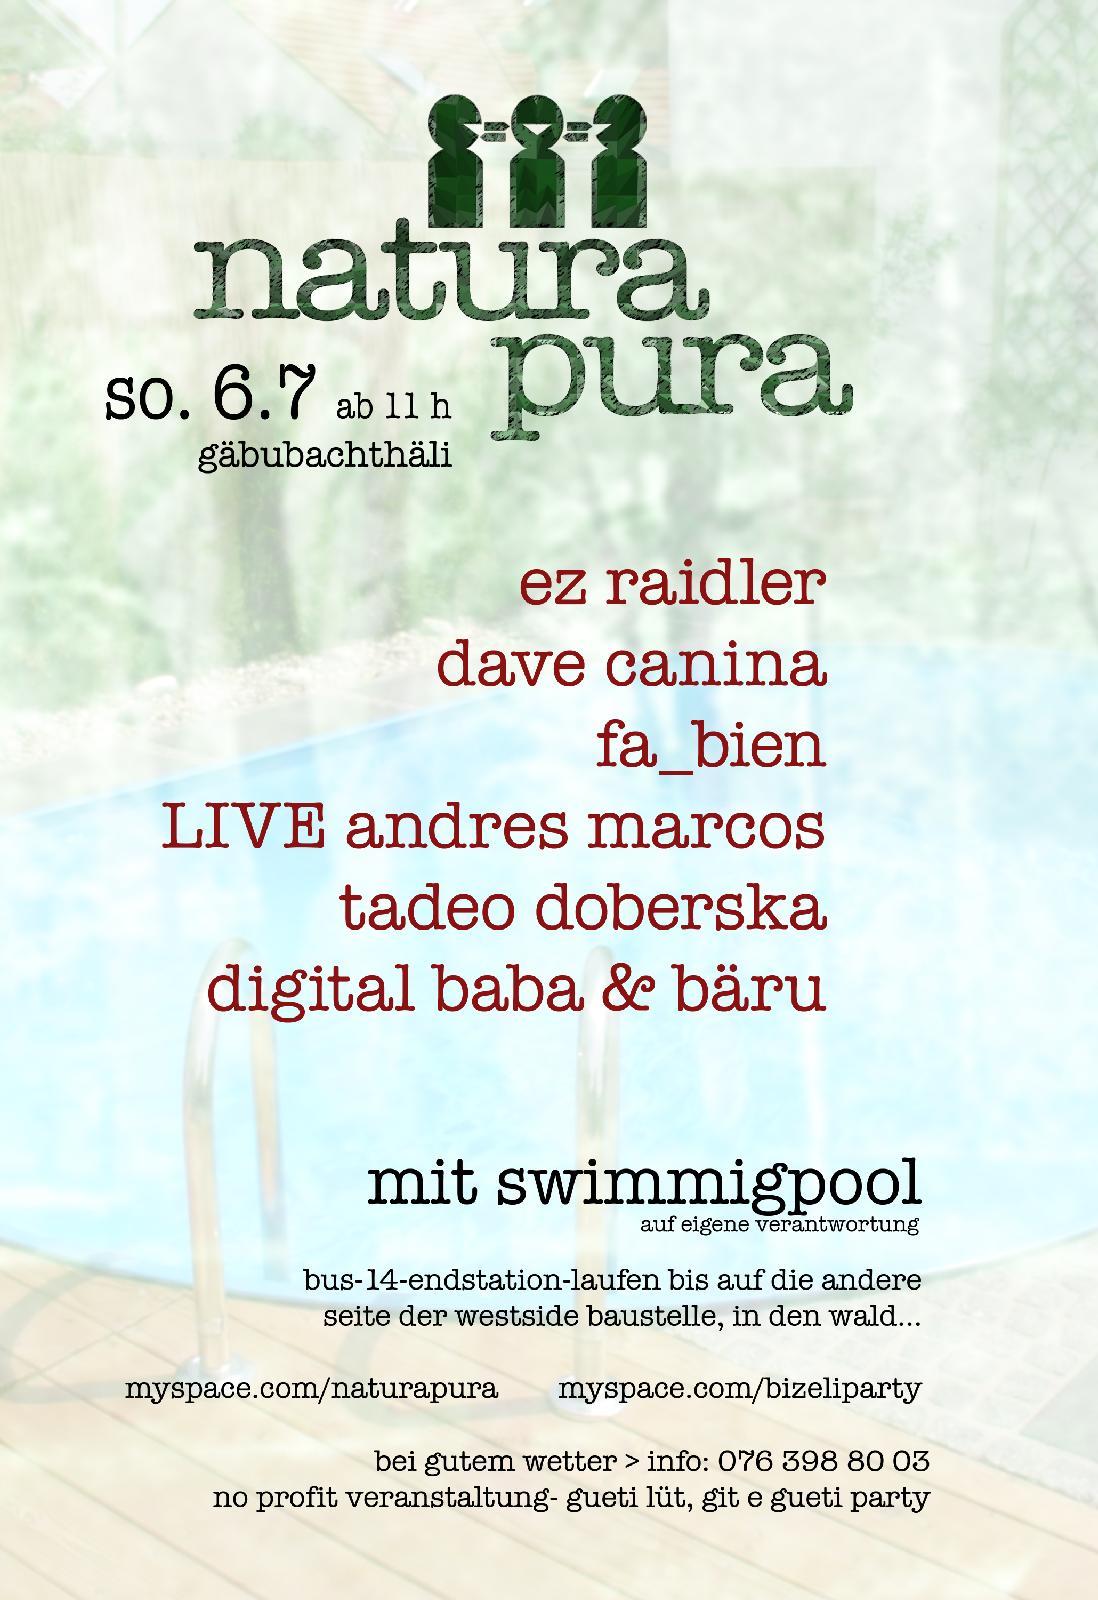 naturapura 06/07/08